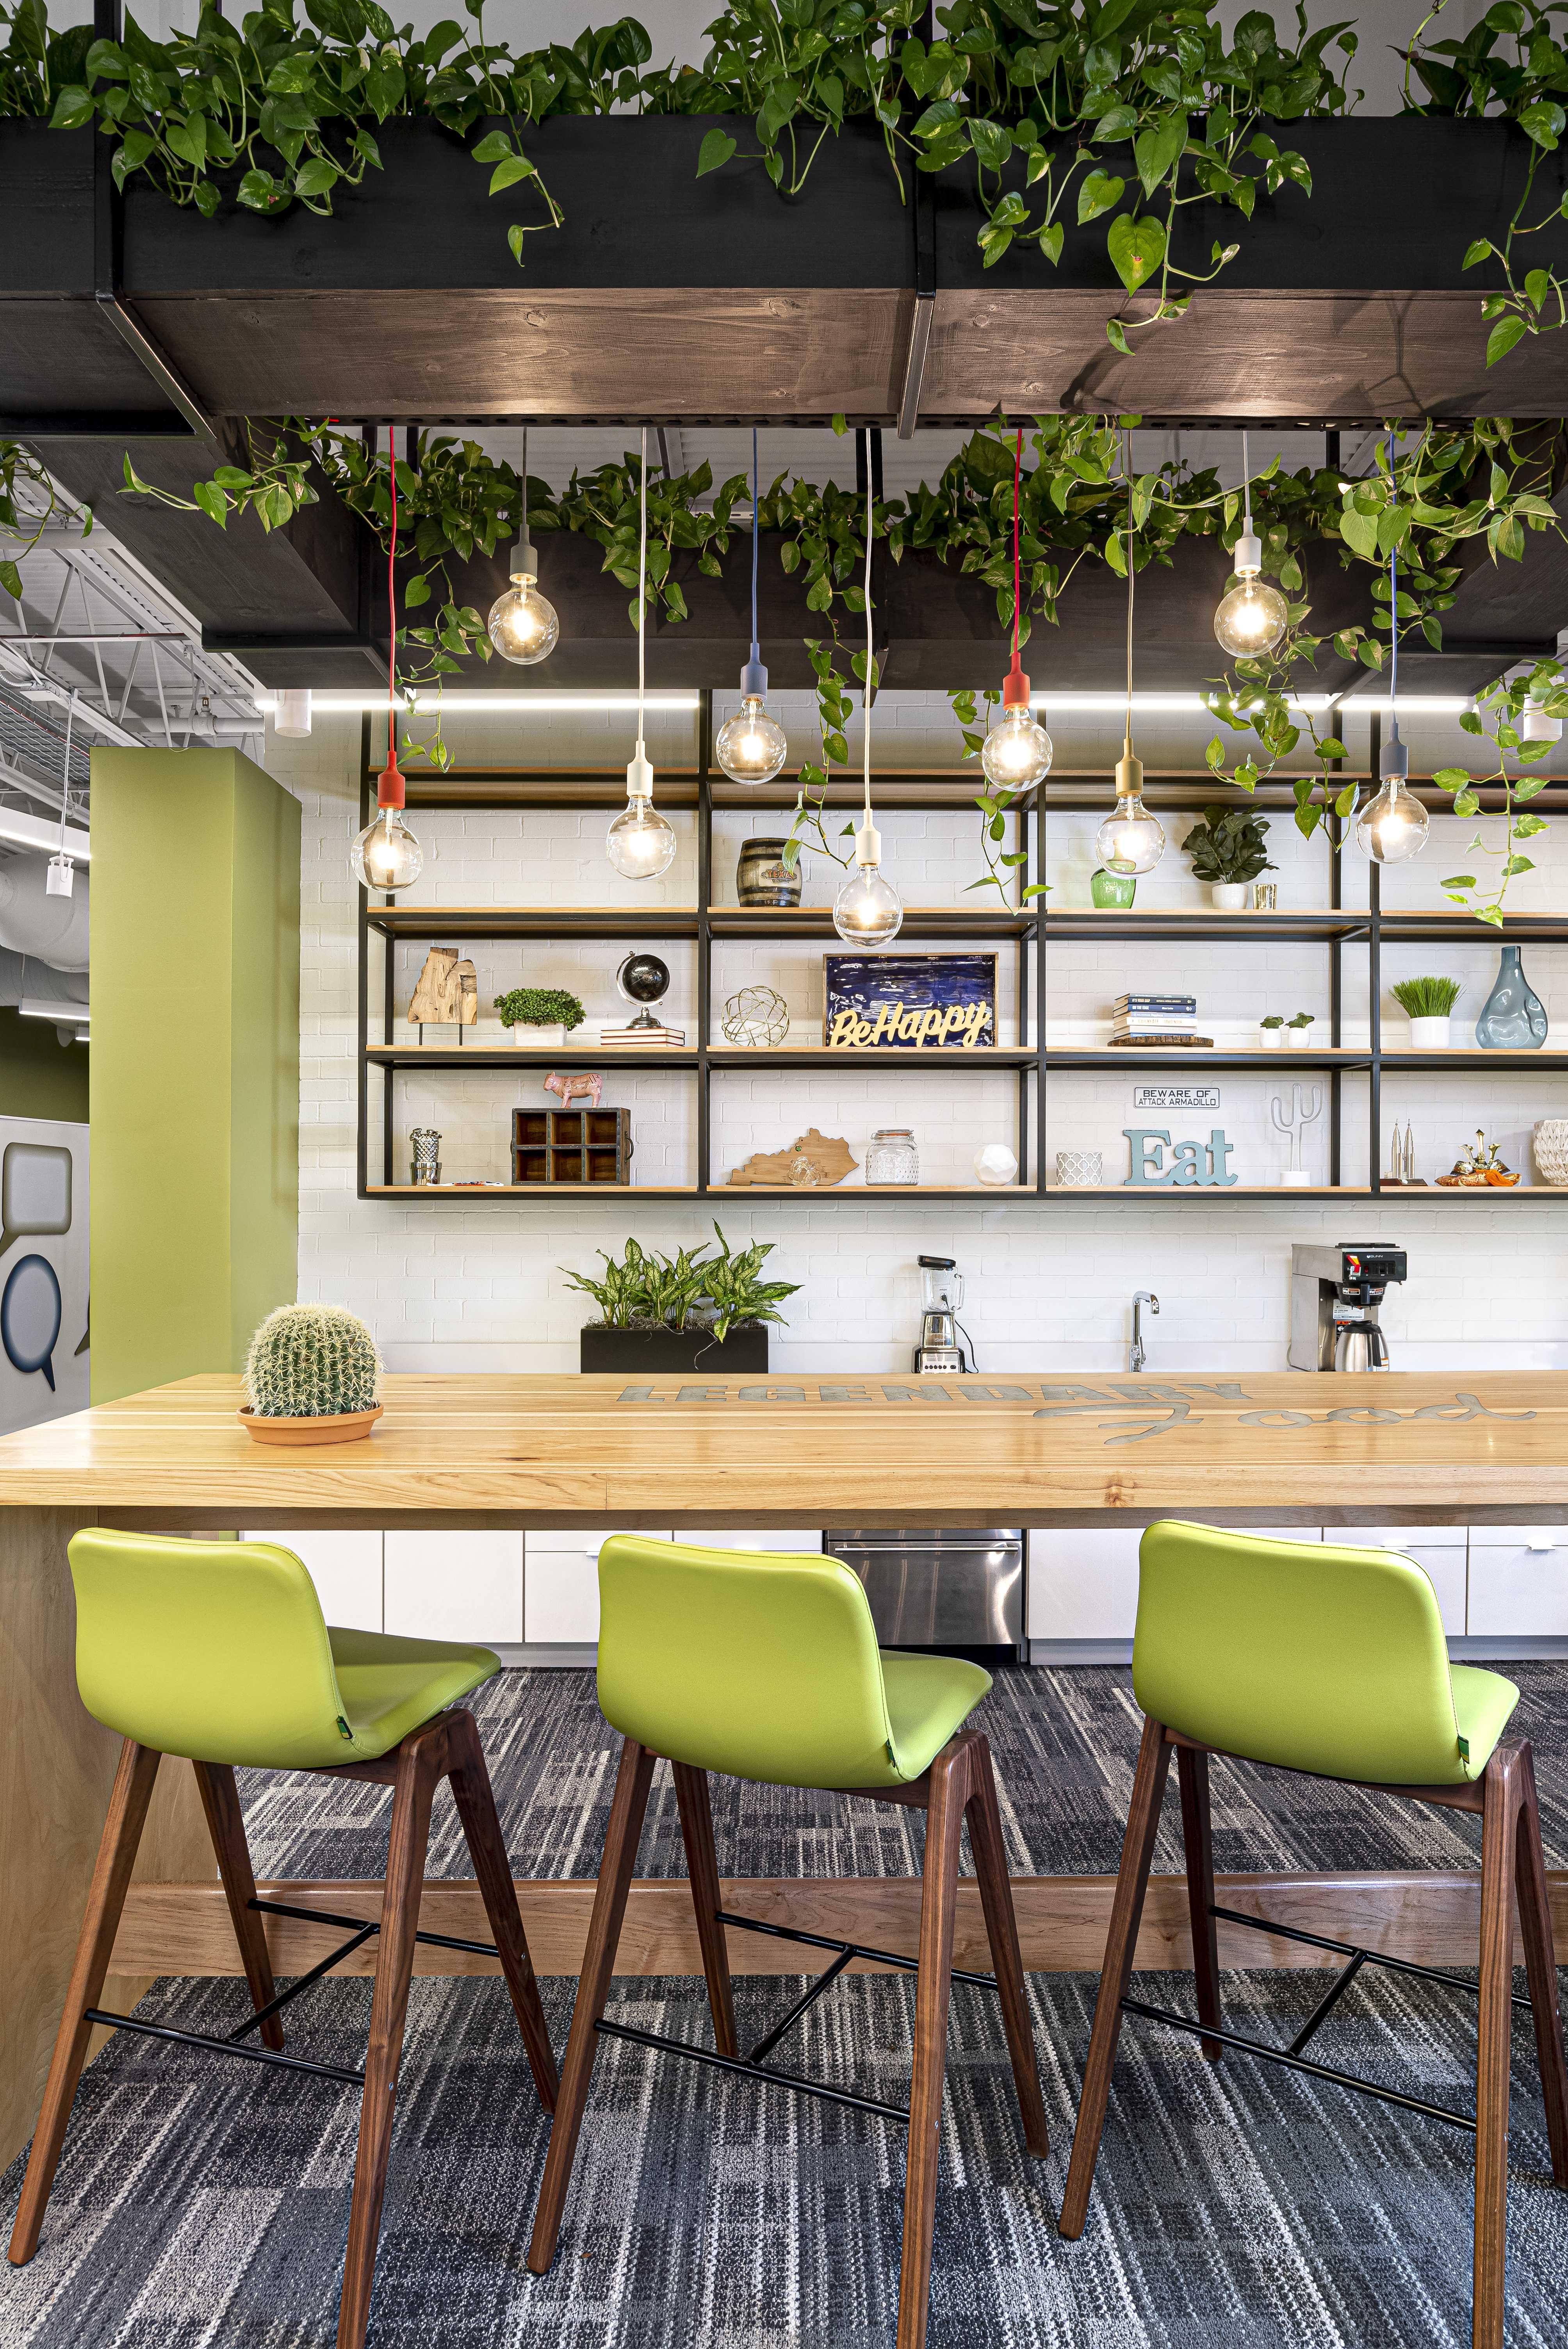 texas-roadhouse-office-green-bar